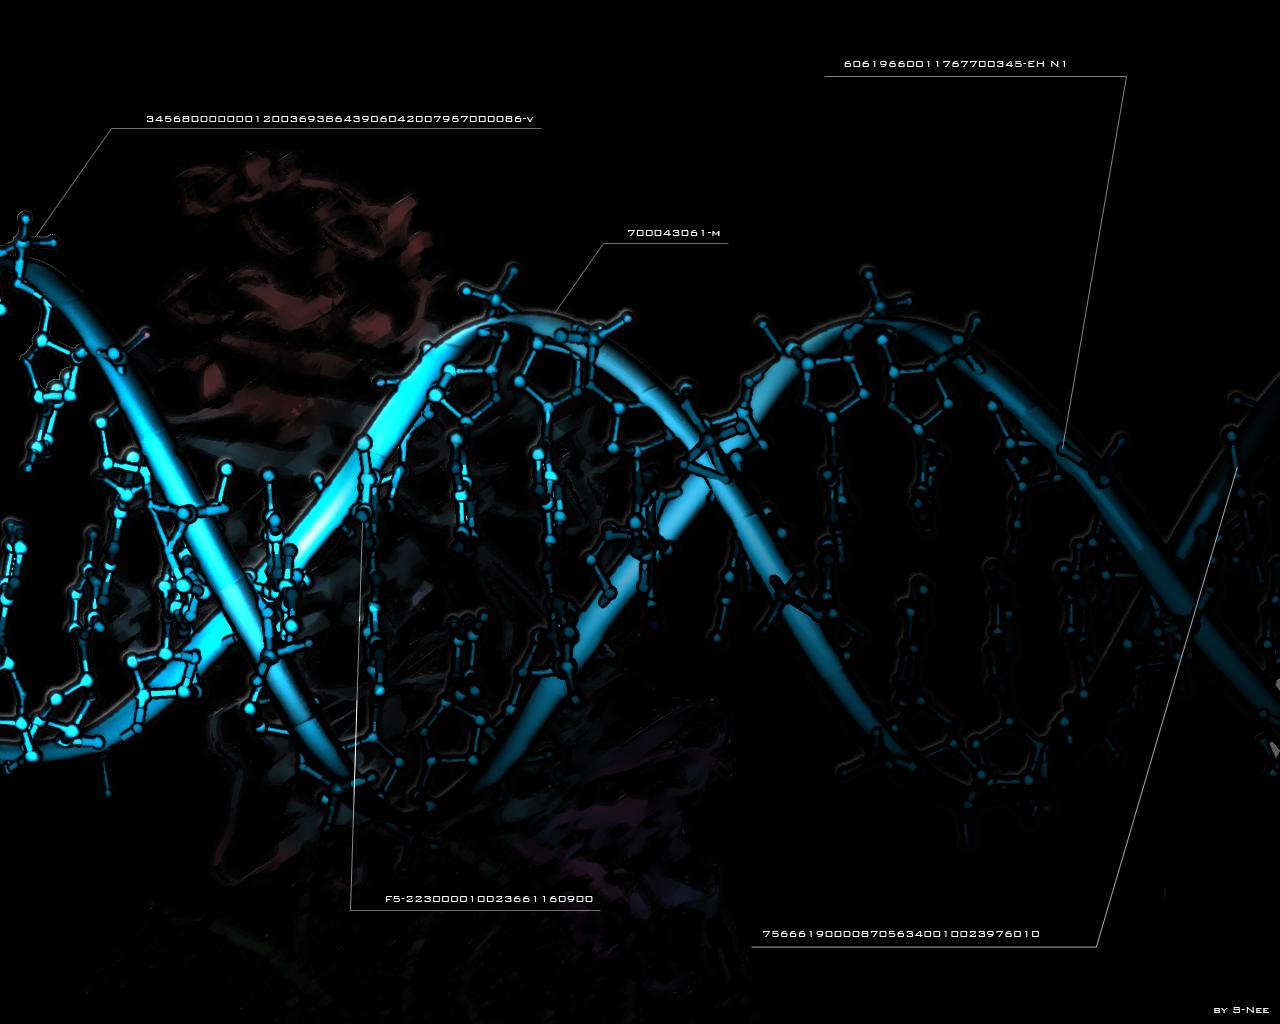 Download Dna Molecule Wallpaper 1280x1024 Full HD Wallpapers 1280x1024